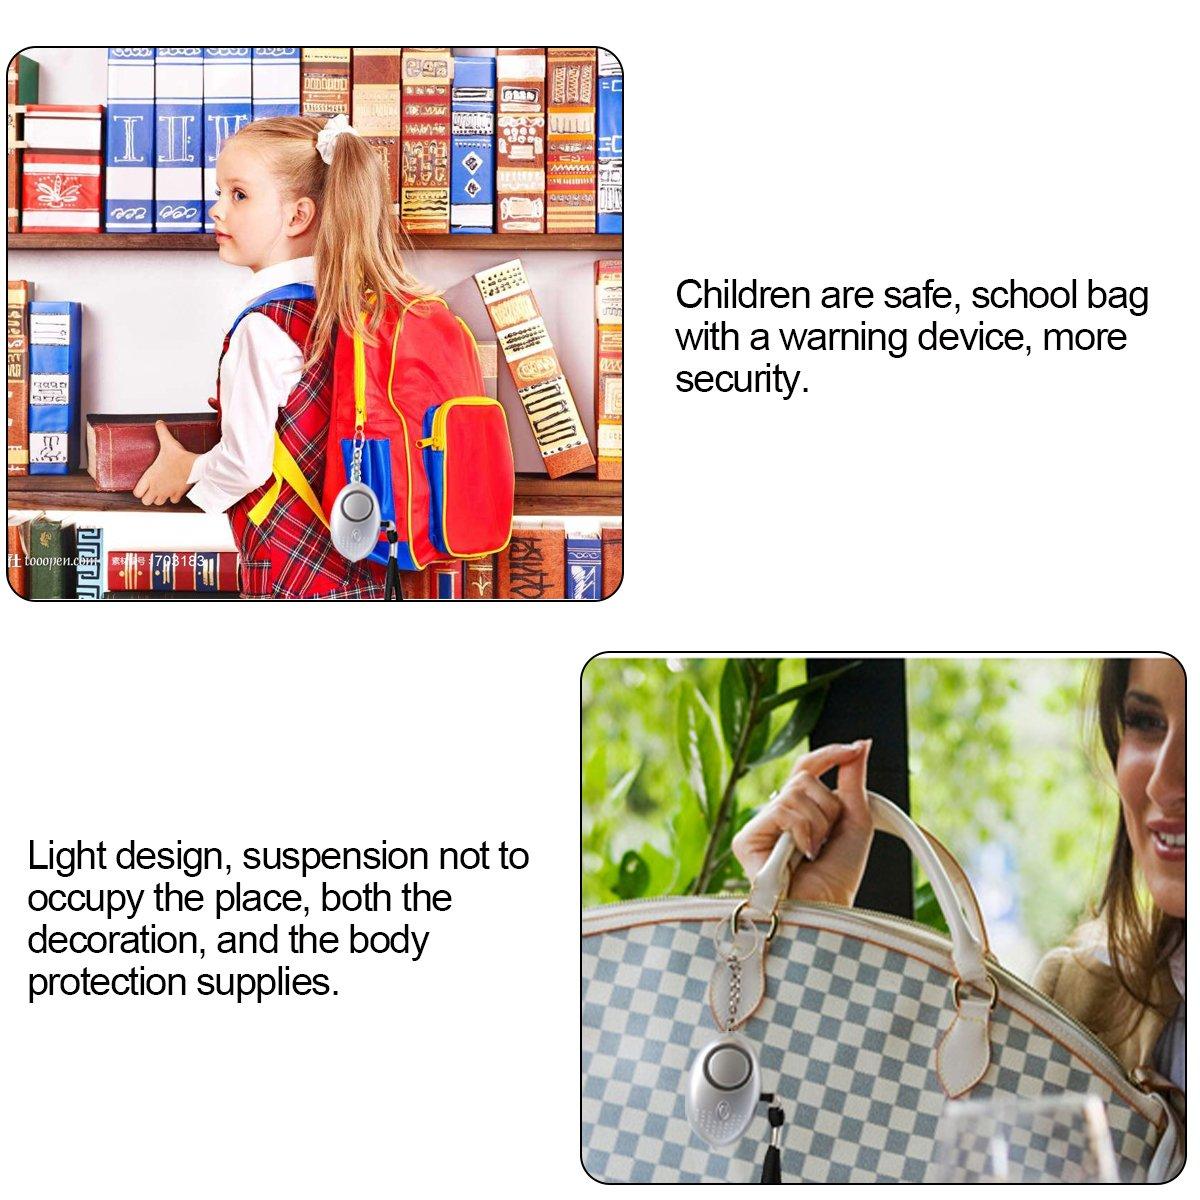 Emergency Mini Personal Alarm - Safe 120dB Self Personal Sound alarm kits & Emergency LED Flashlight,Emergency Personal Alarm Keychain Self Defense for Women Girls Kids,Alarm Noise to Scare Attackers